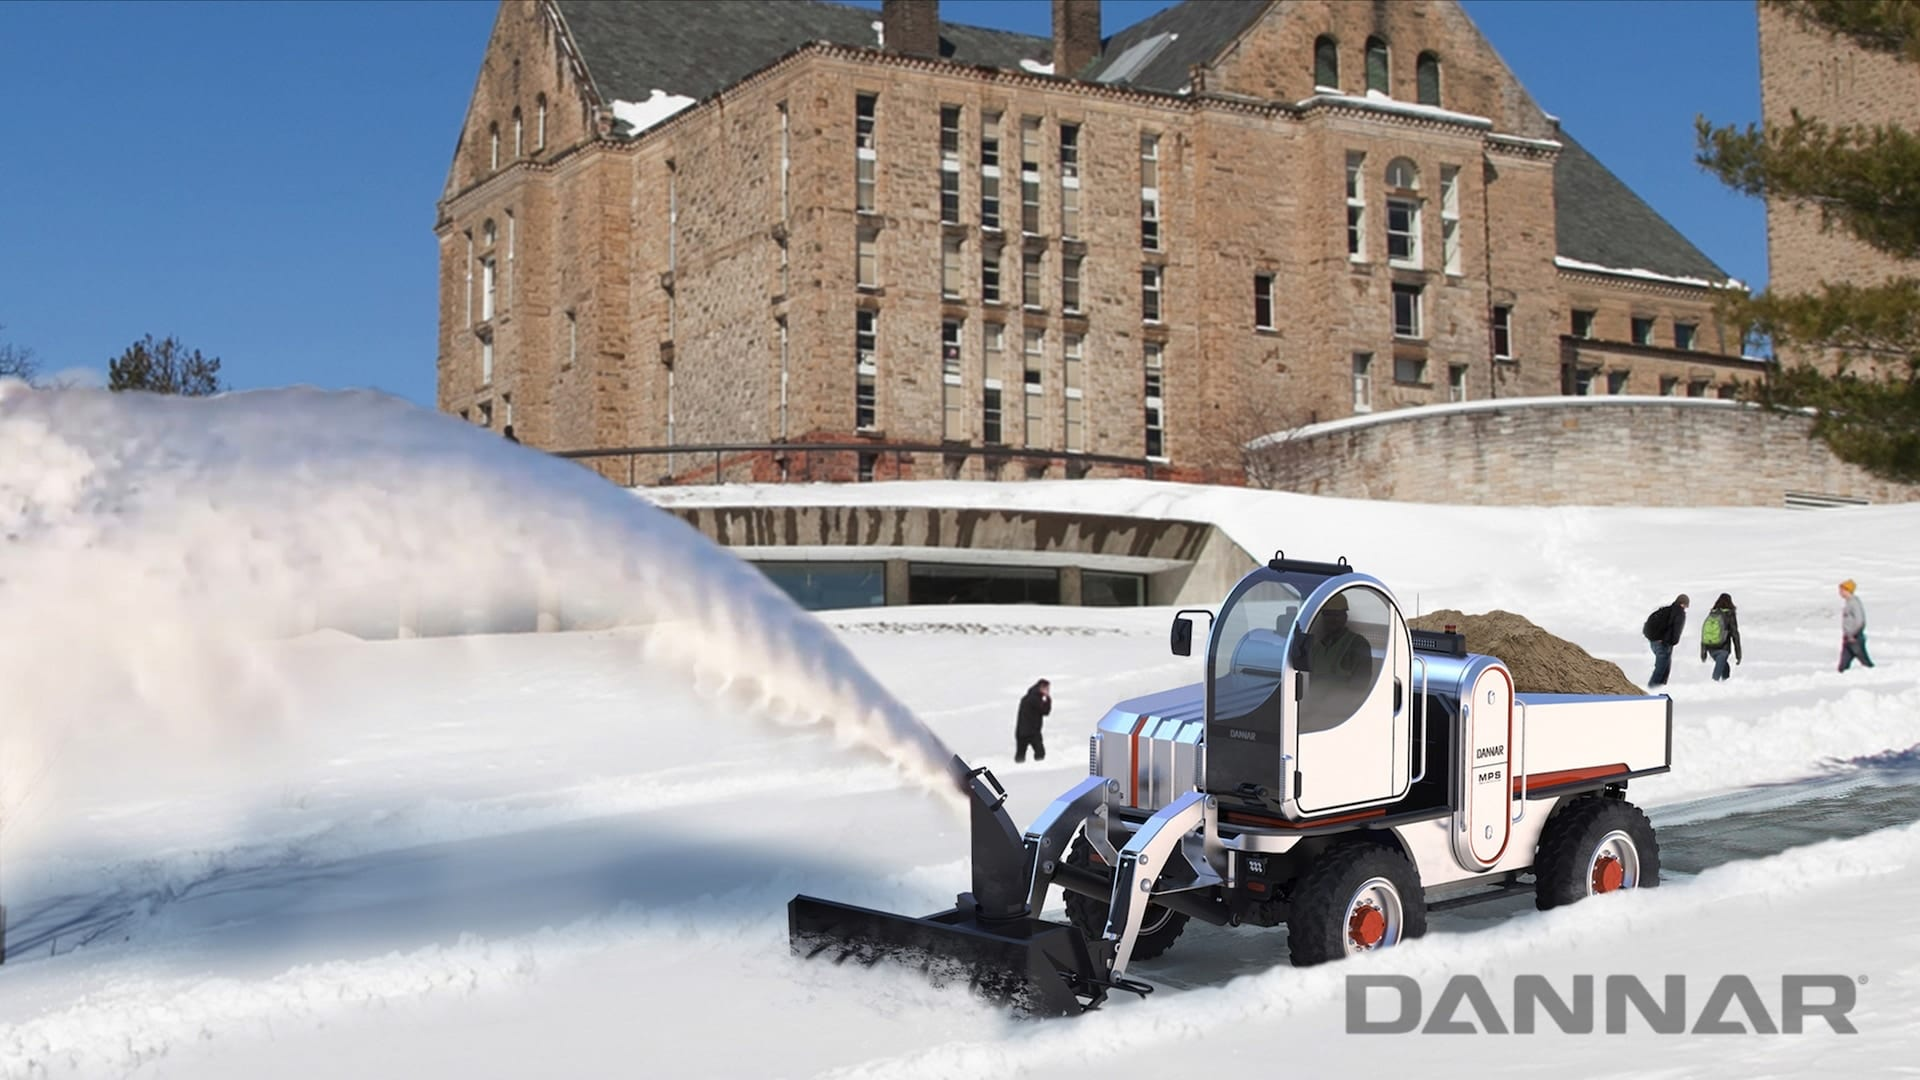 DANNAR MPS 400 Revolutionary Work Vehicle All Season